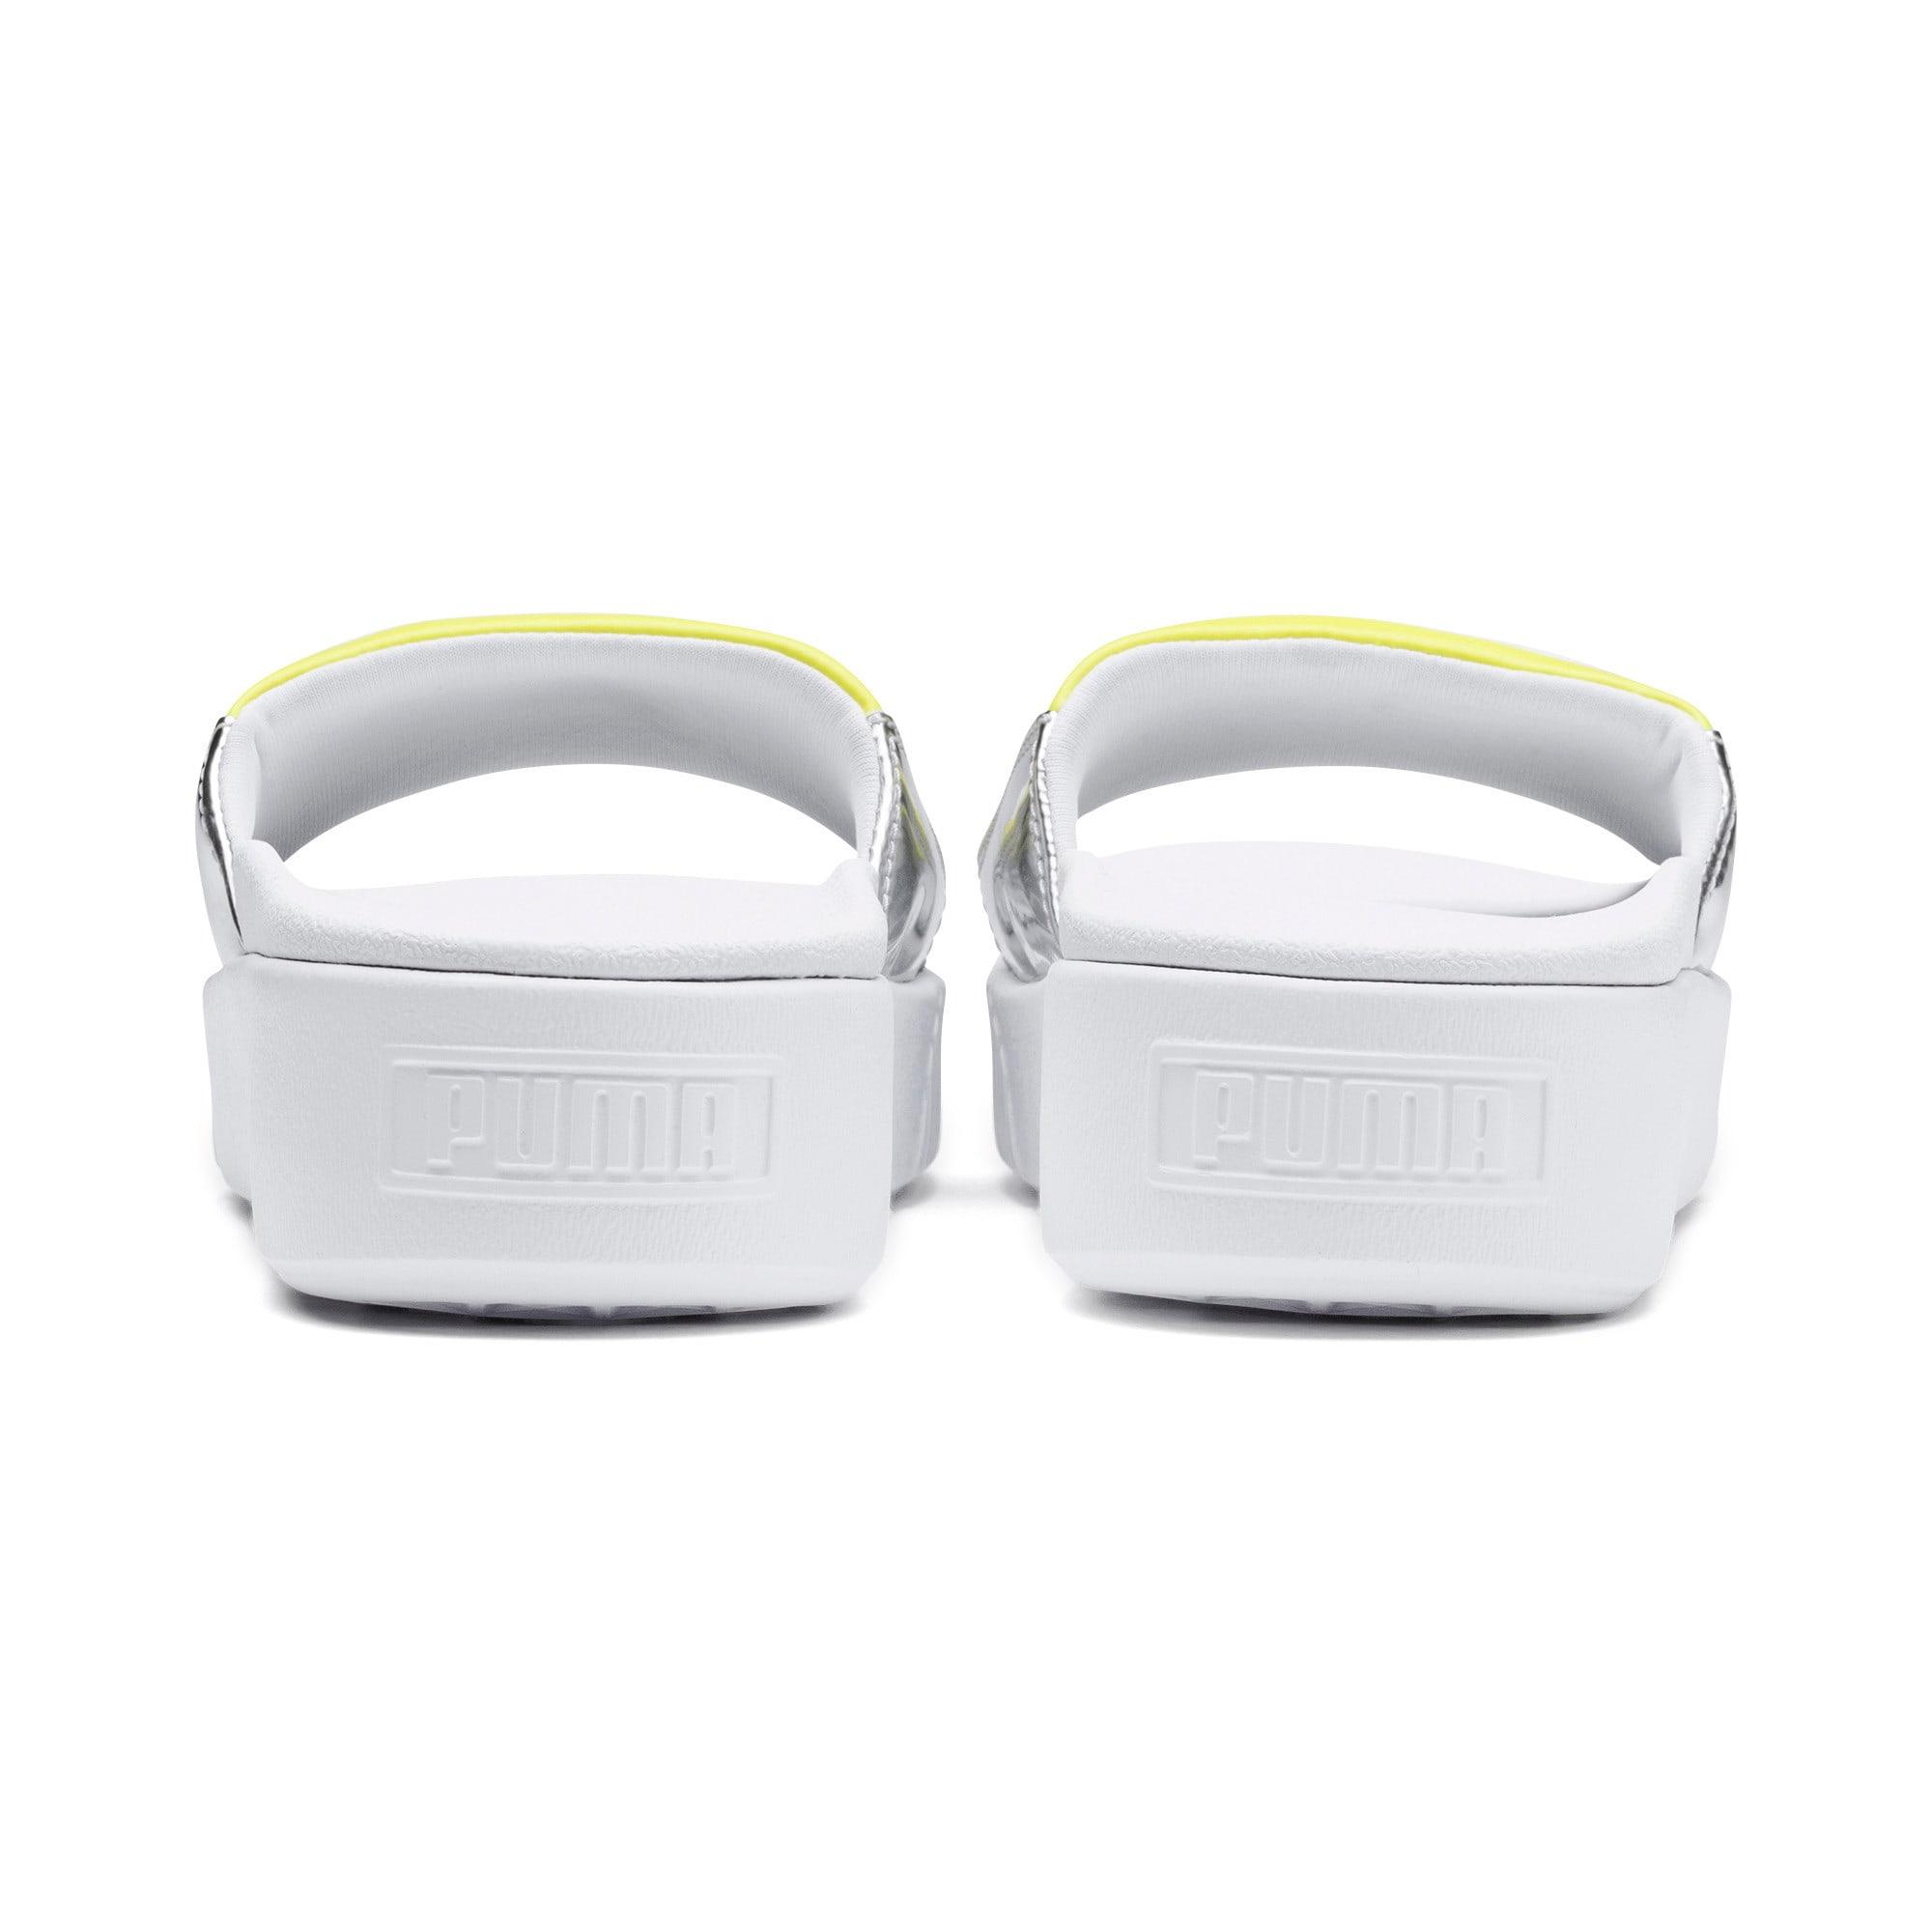 Thumbnail 3 of Platform Slide Trailblazer Metallic Women's Sandals, Puma White-Puma Silver, medium